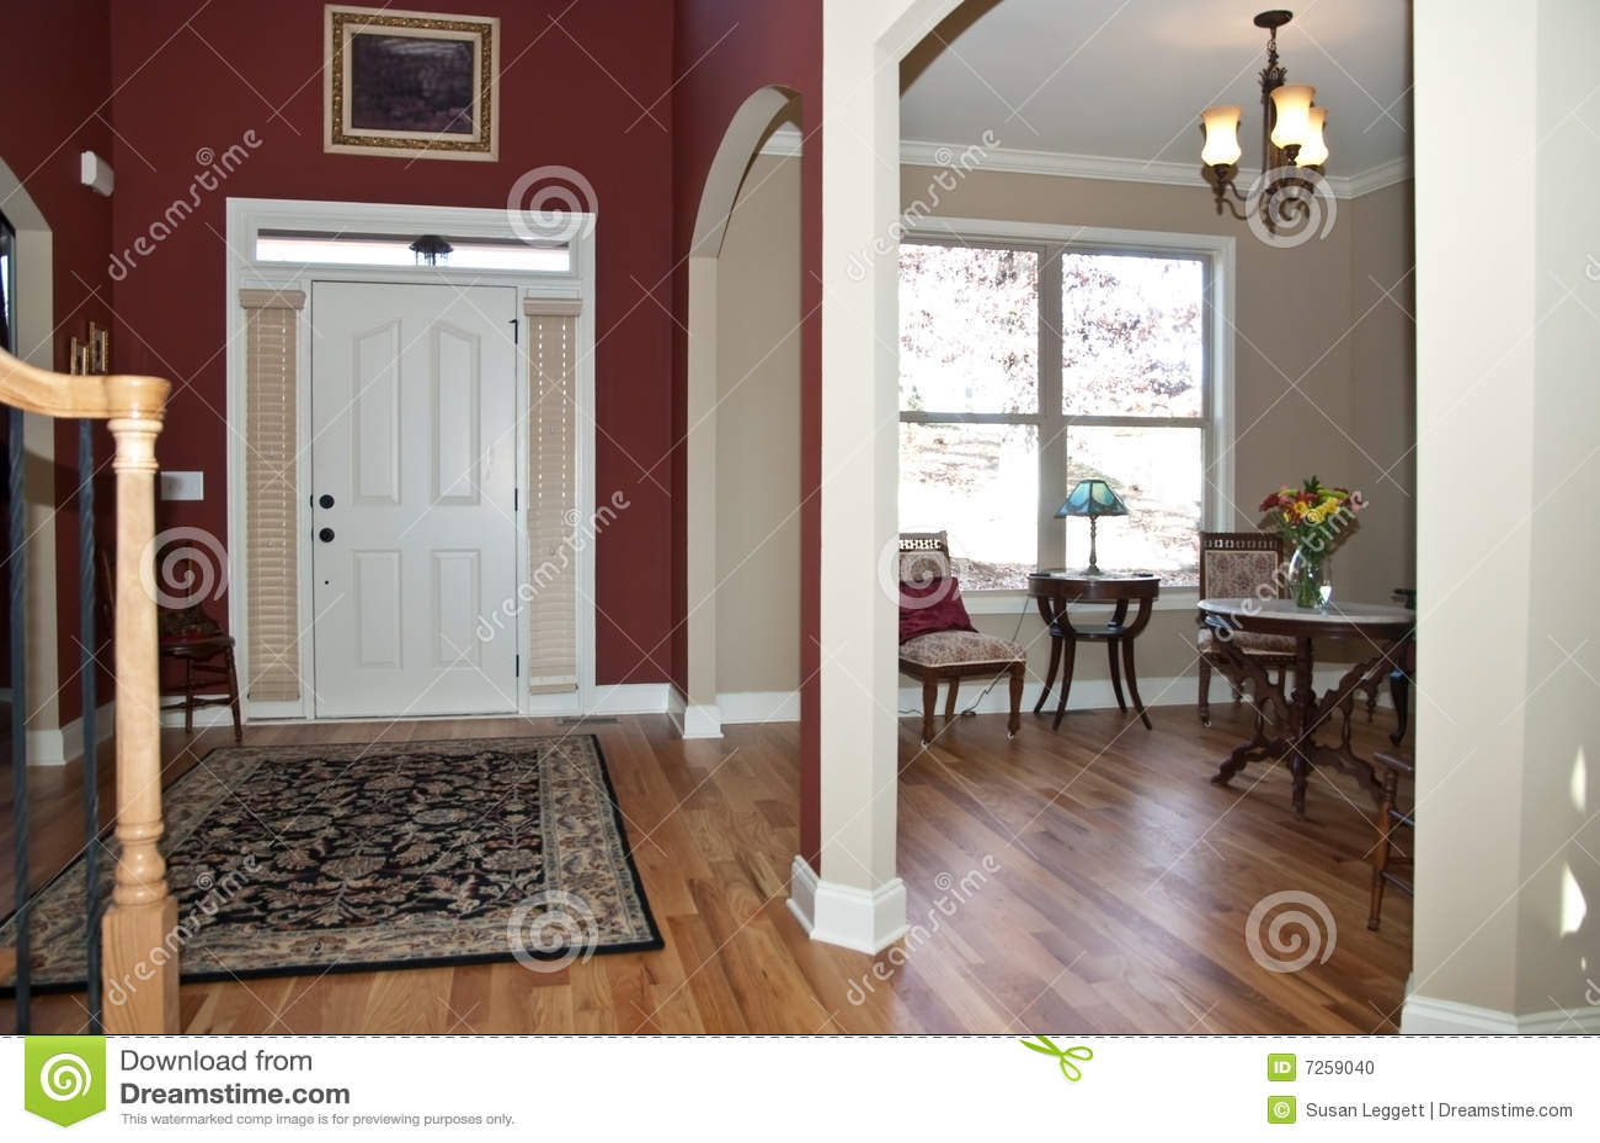 Hogar entrada sala de estar modernos foto de archivo for Muebles de sala de estar modernos